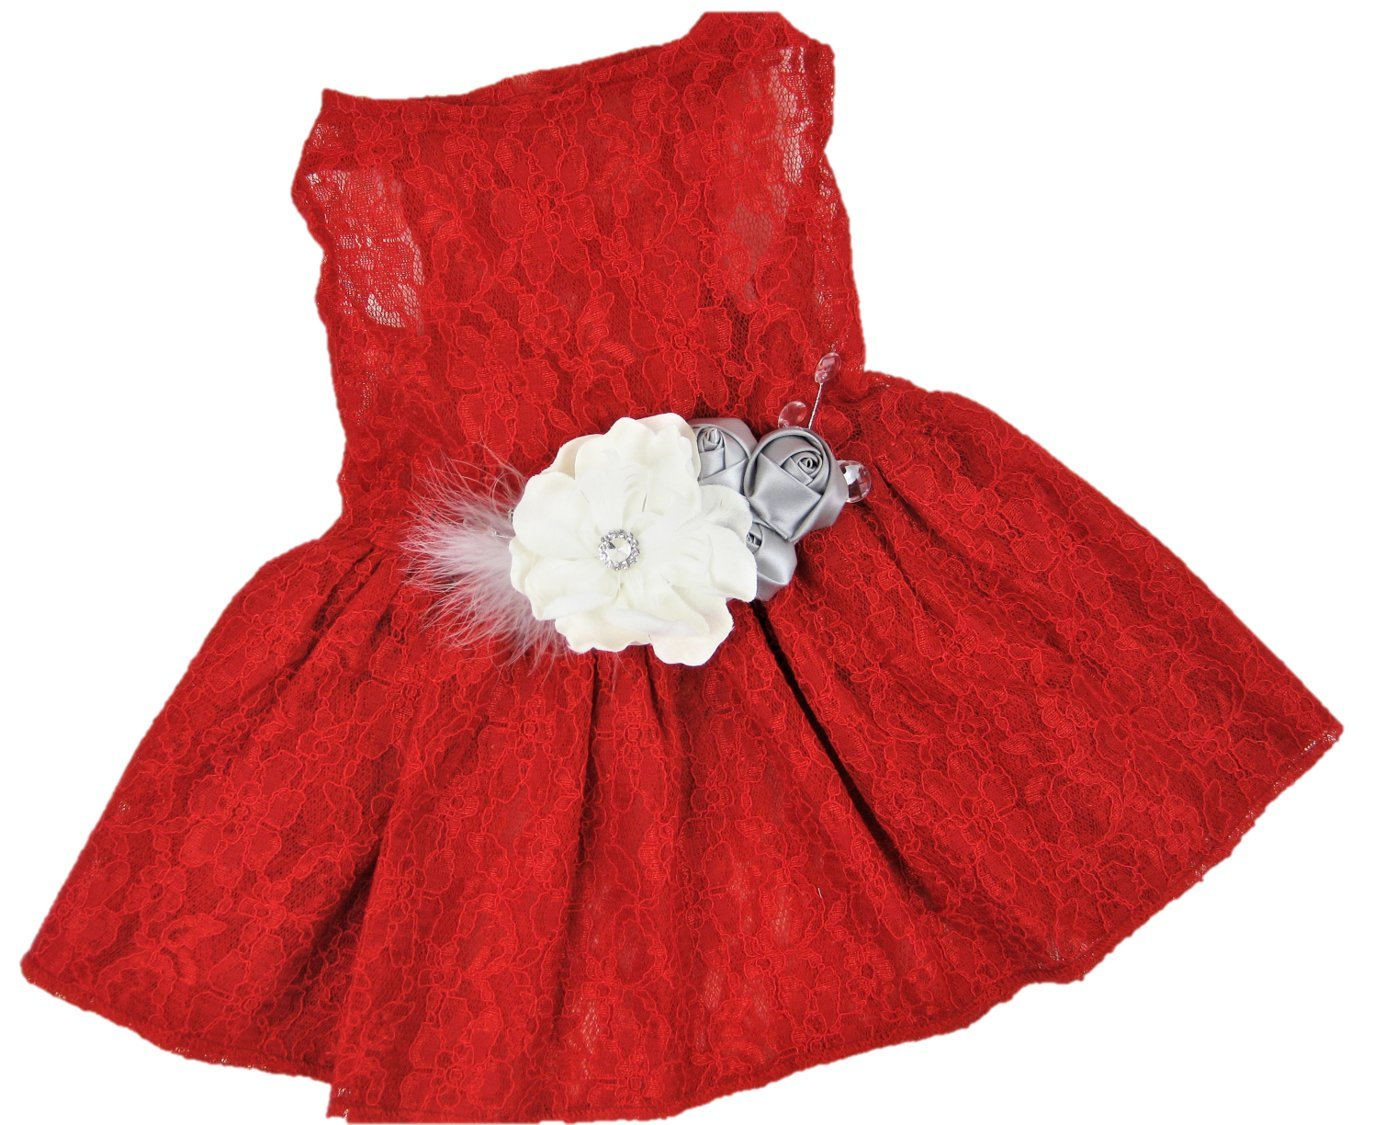 House of FurBaby Christmas Dog Dress | Holiday Dog Dress | Red Lace | XS to XXXL (XXXL) by House of FurBaby